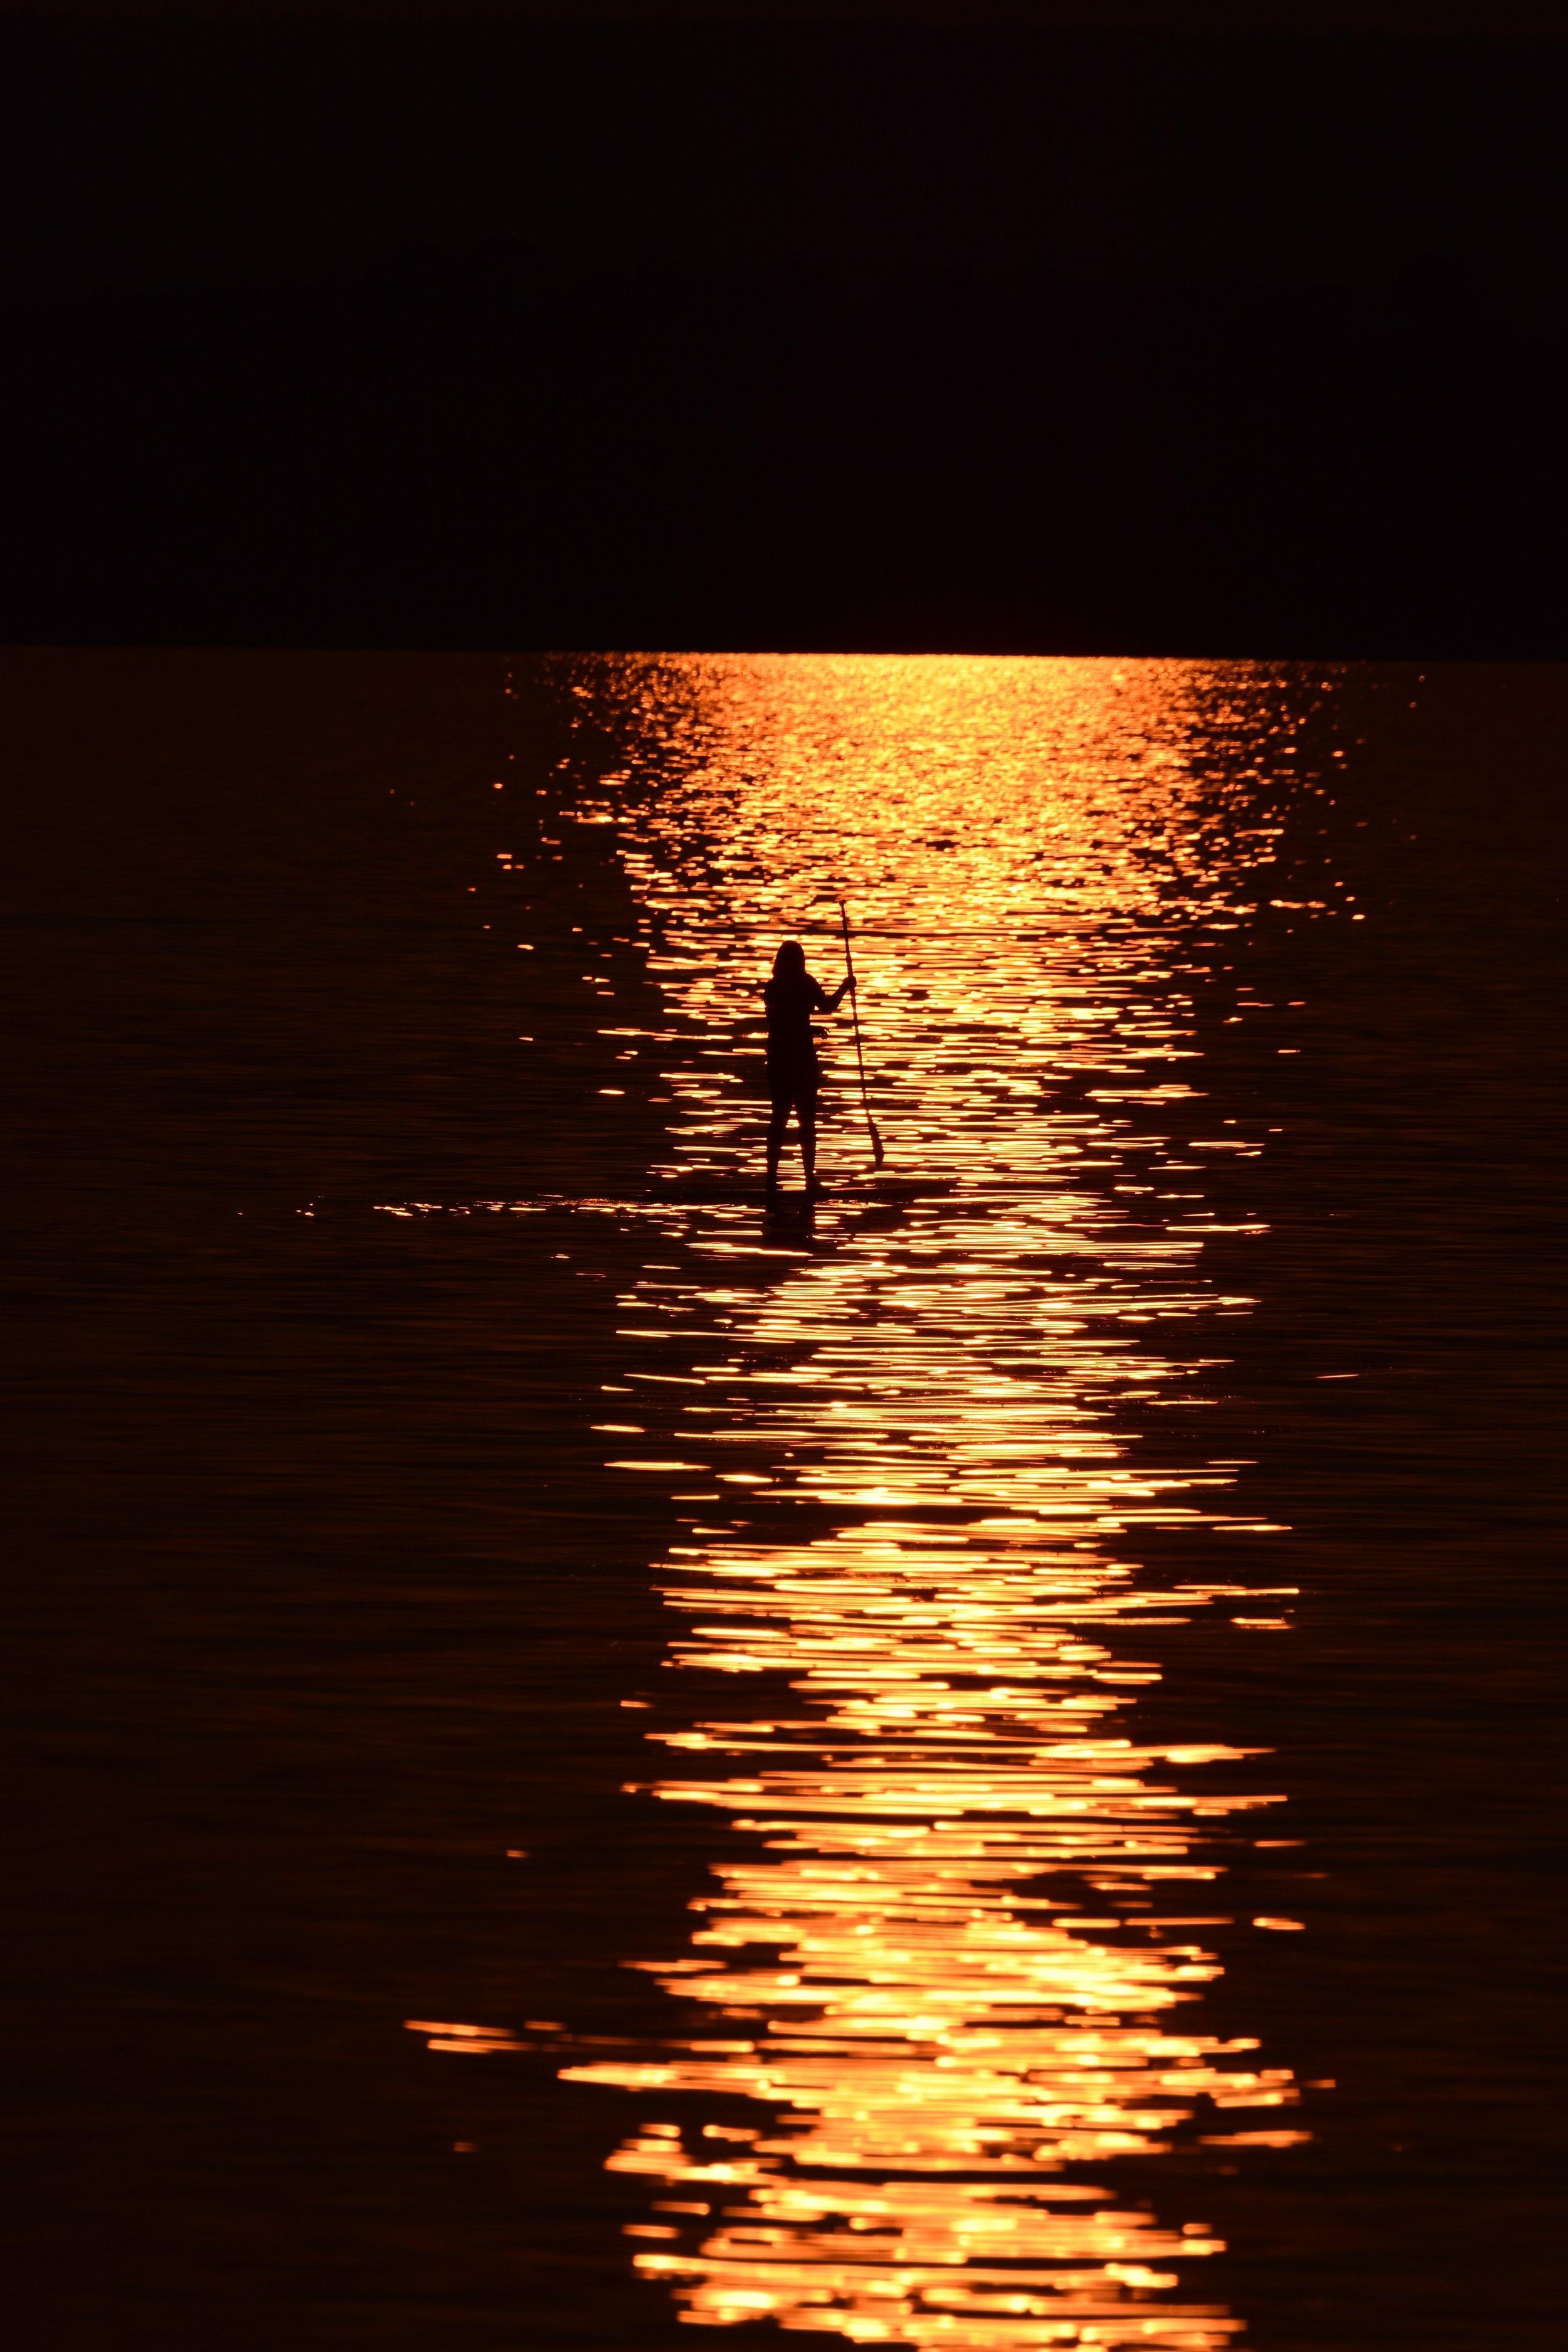 Paddleboarder on Lake Champlain at Sunset_2